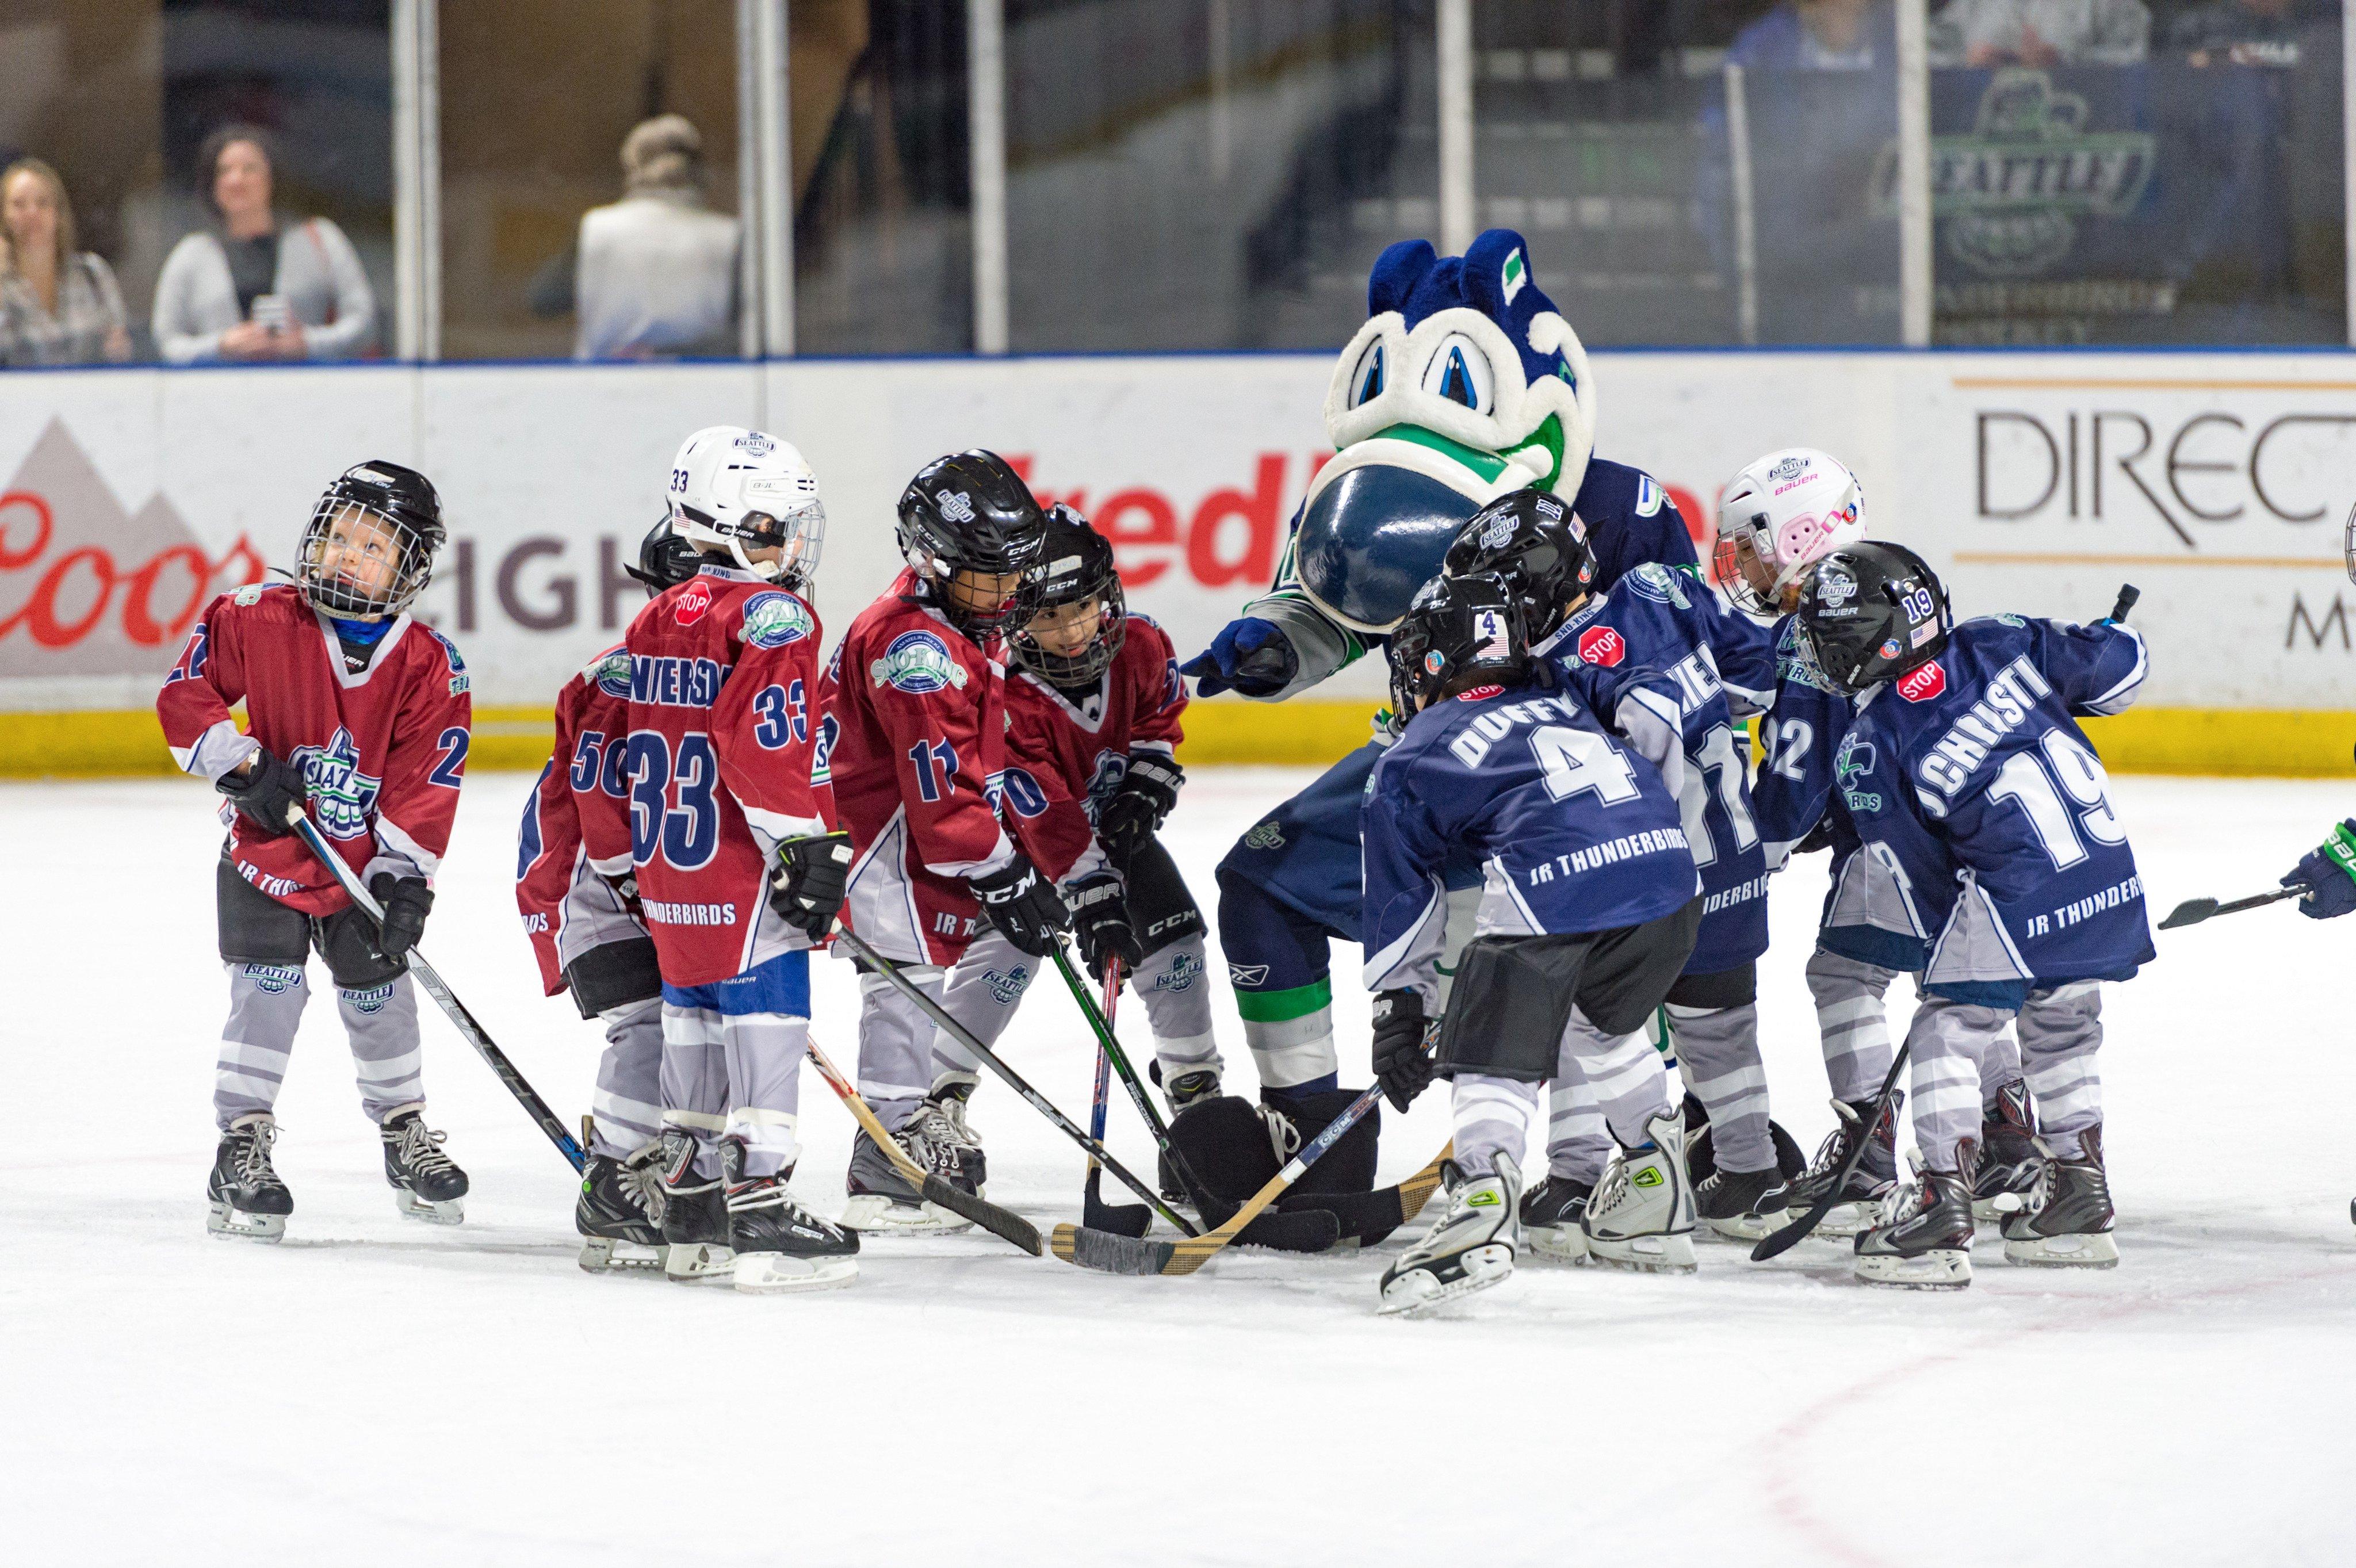 Think, that snoking midget hockey